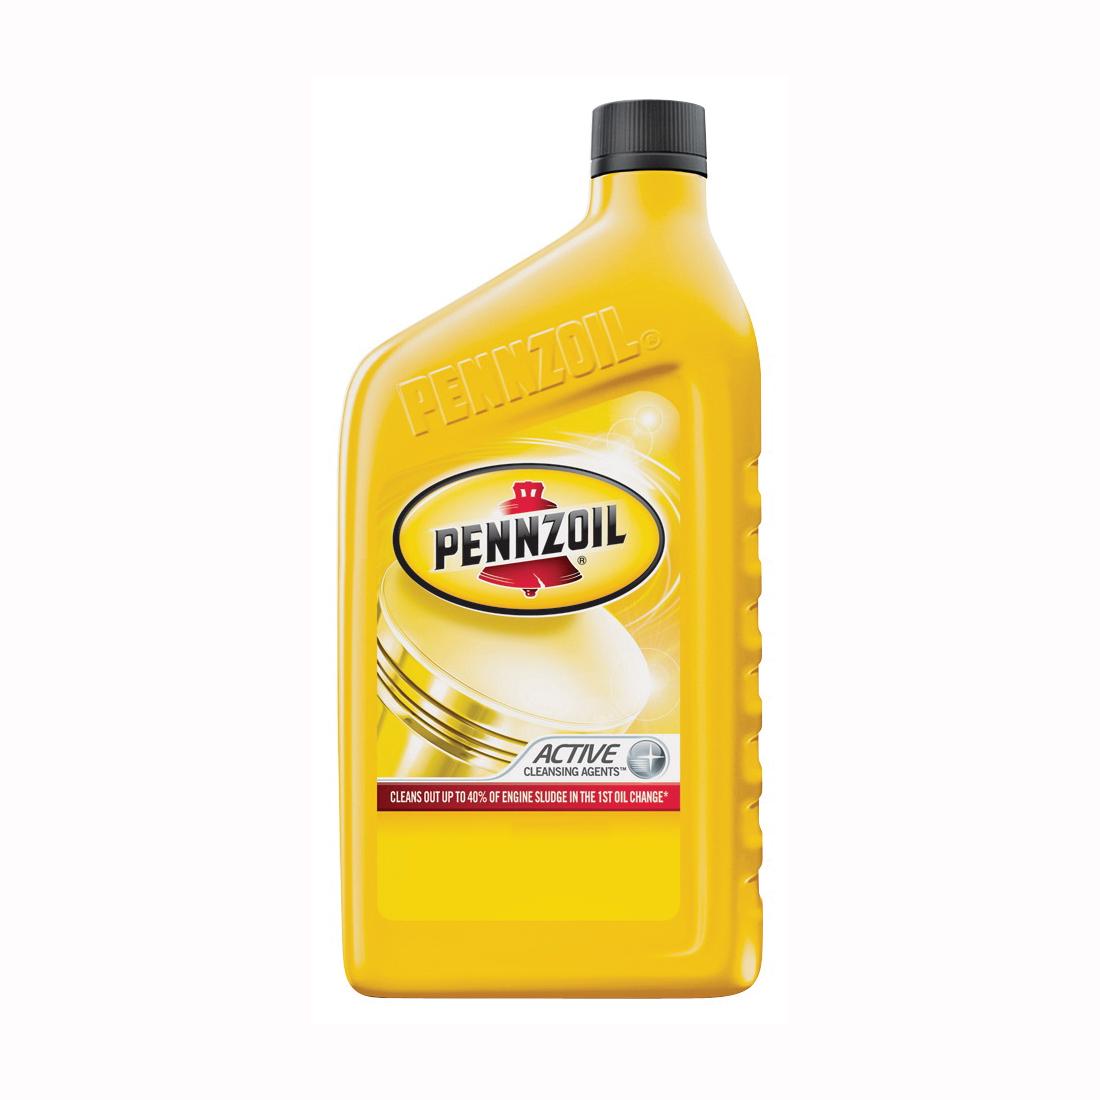 Pennzoil 550035091/3609